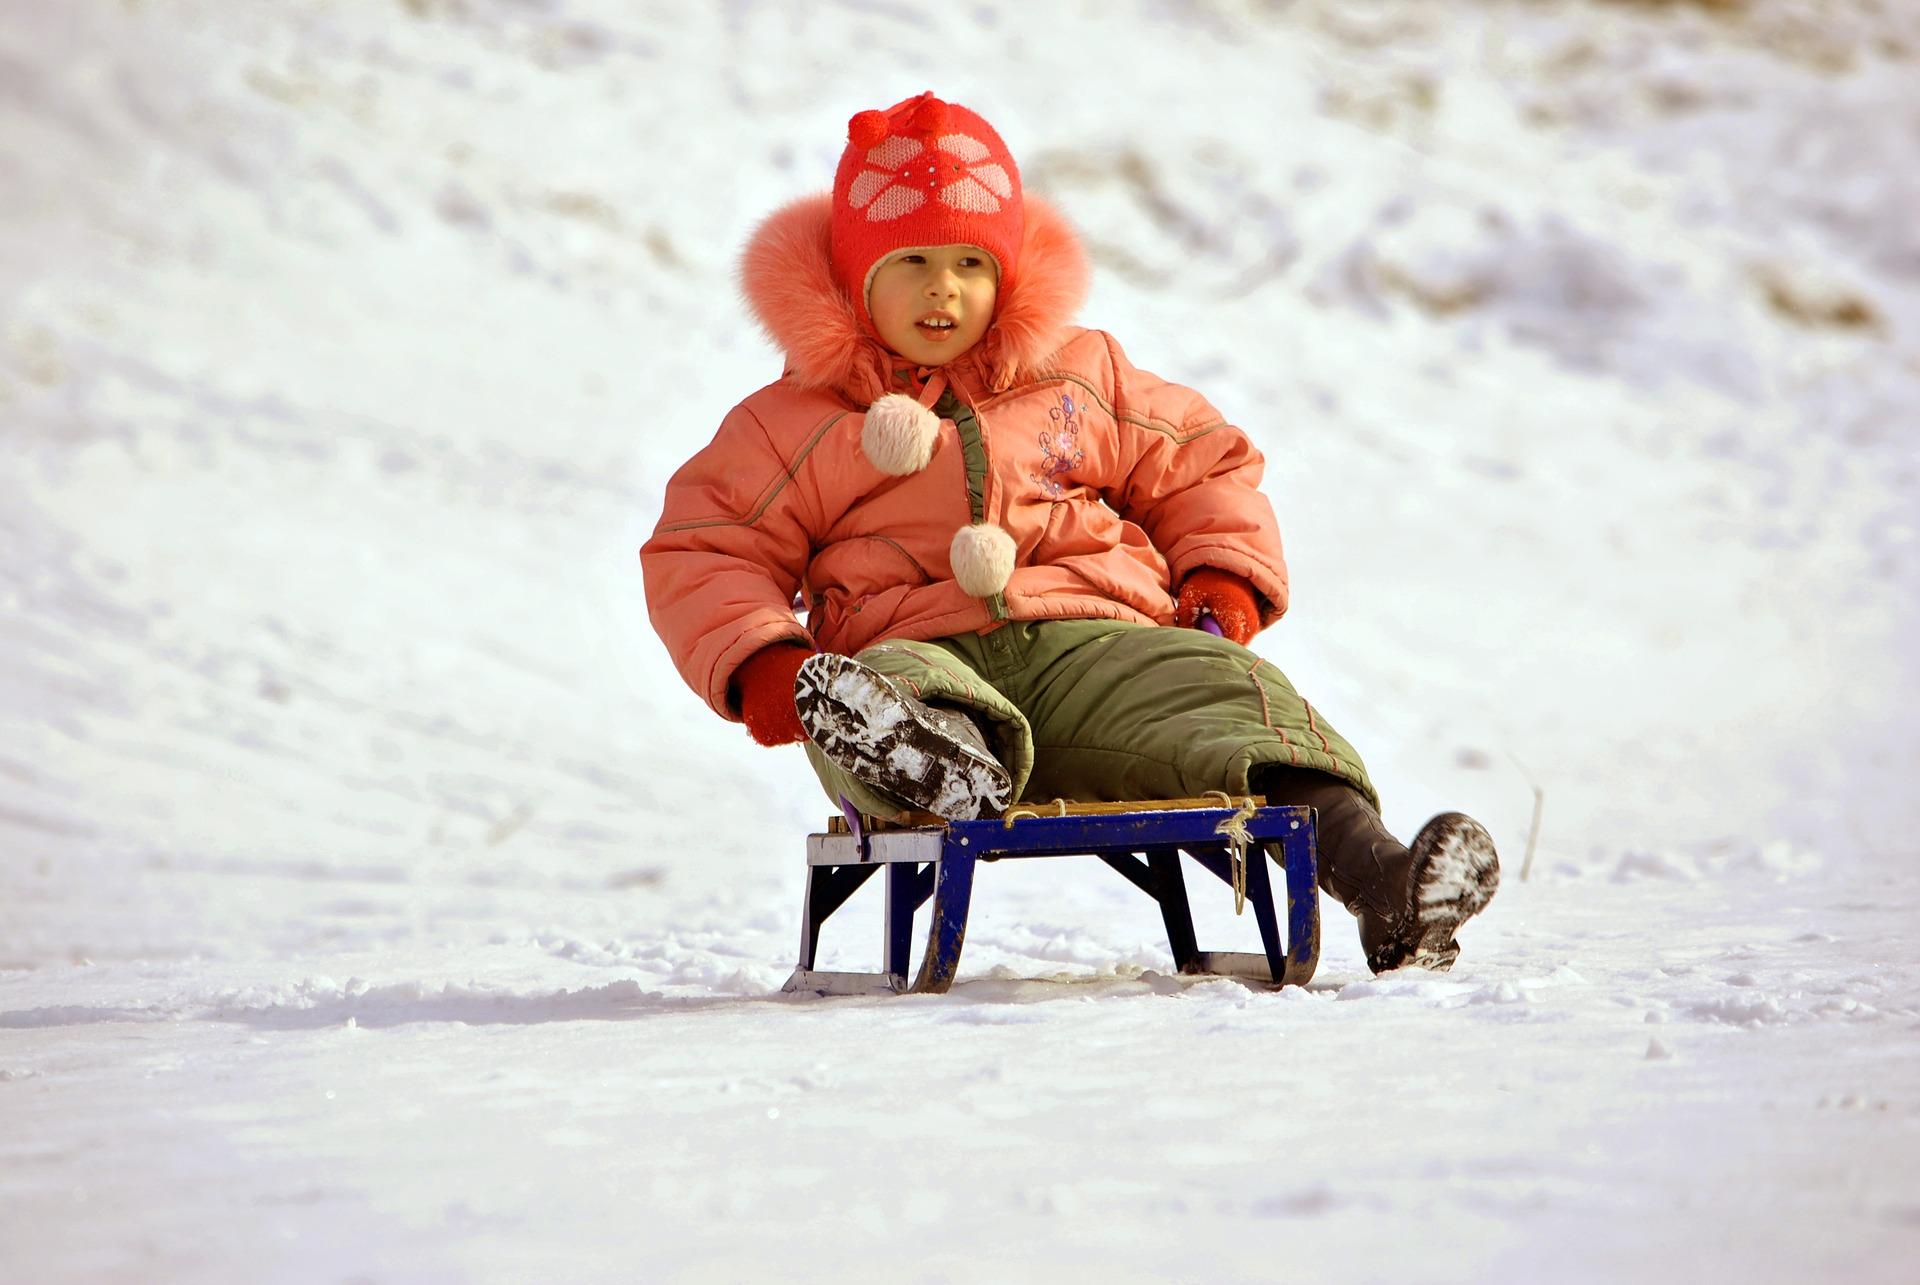 Снежная горка для ребенка